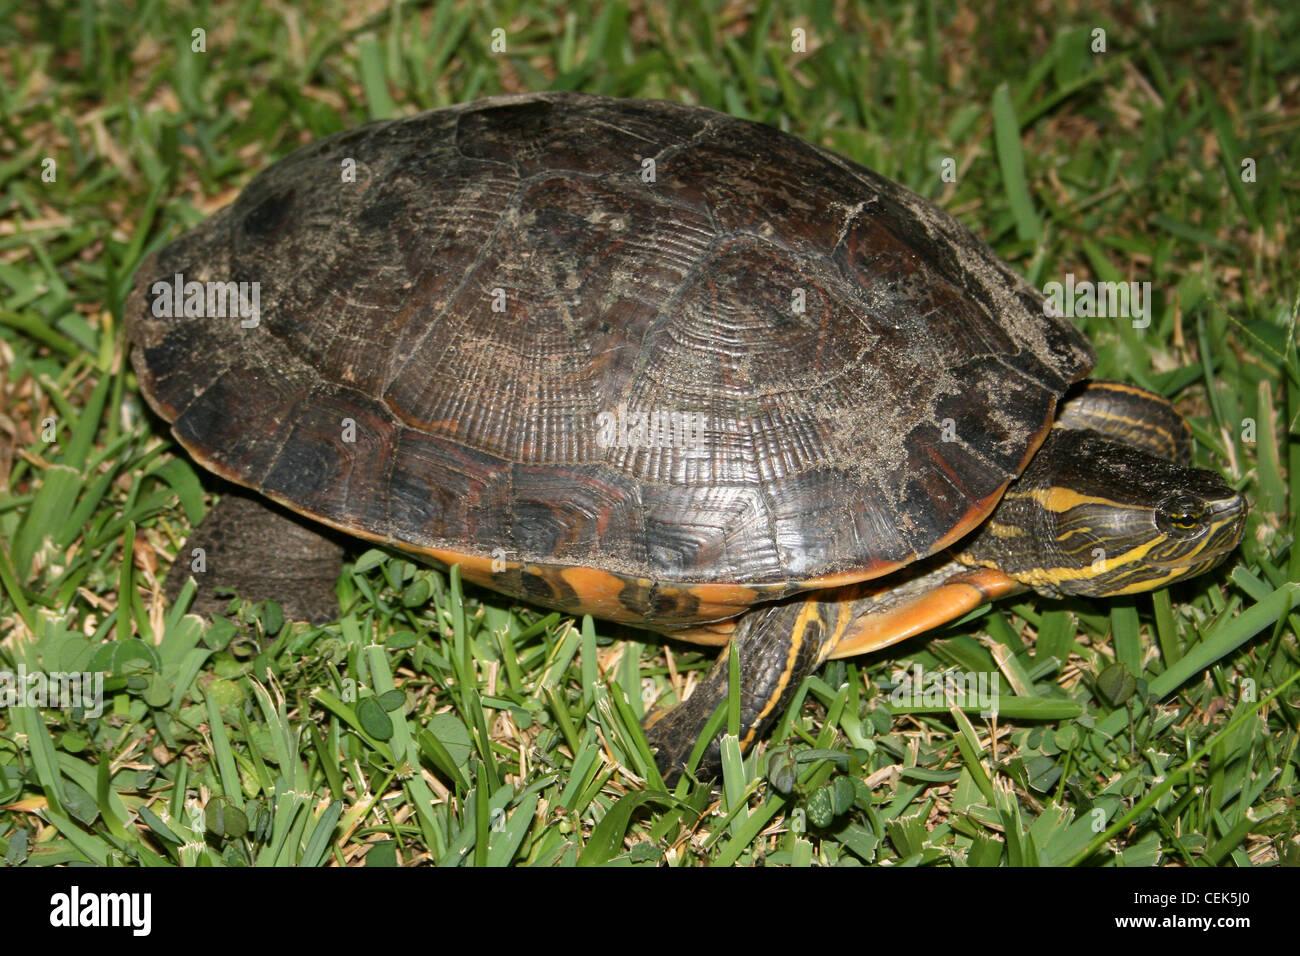 Black River Turtle Rhinoclemmys funerea - Stock Image